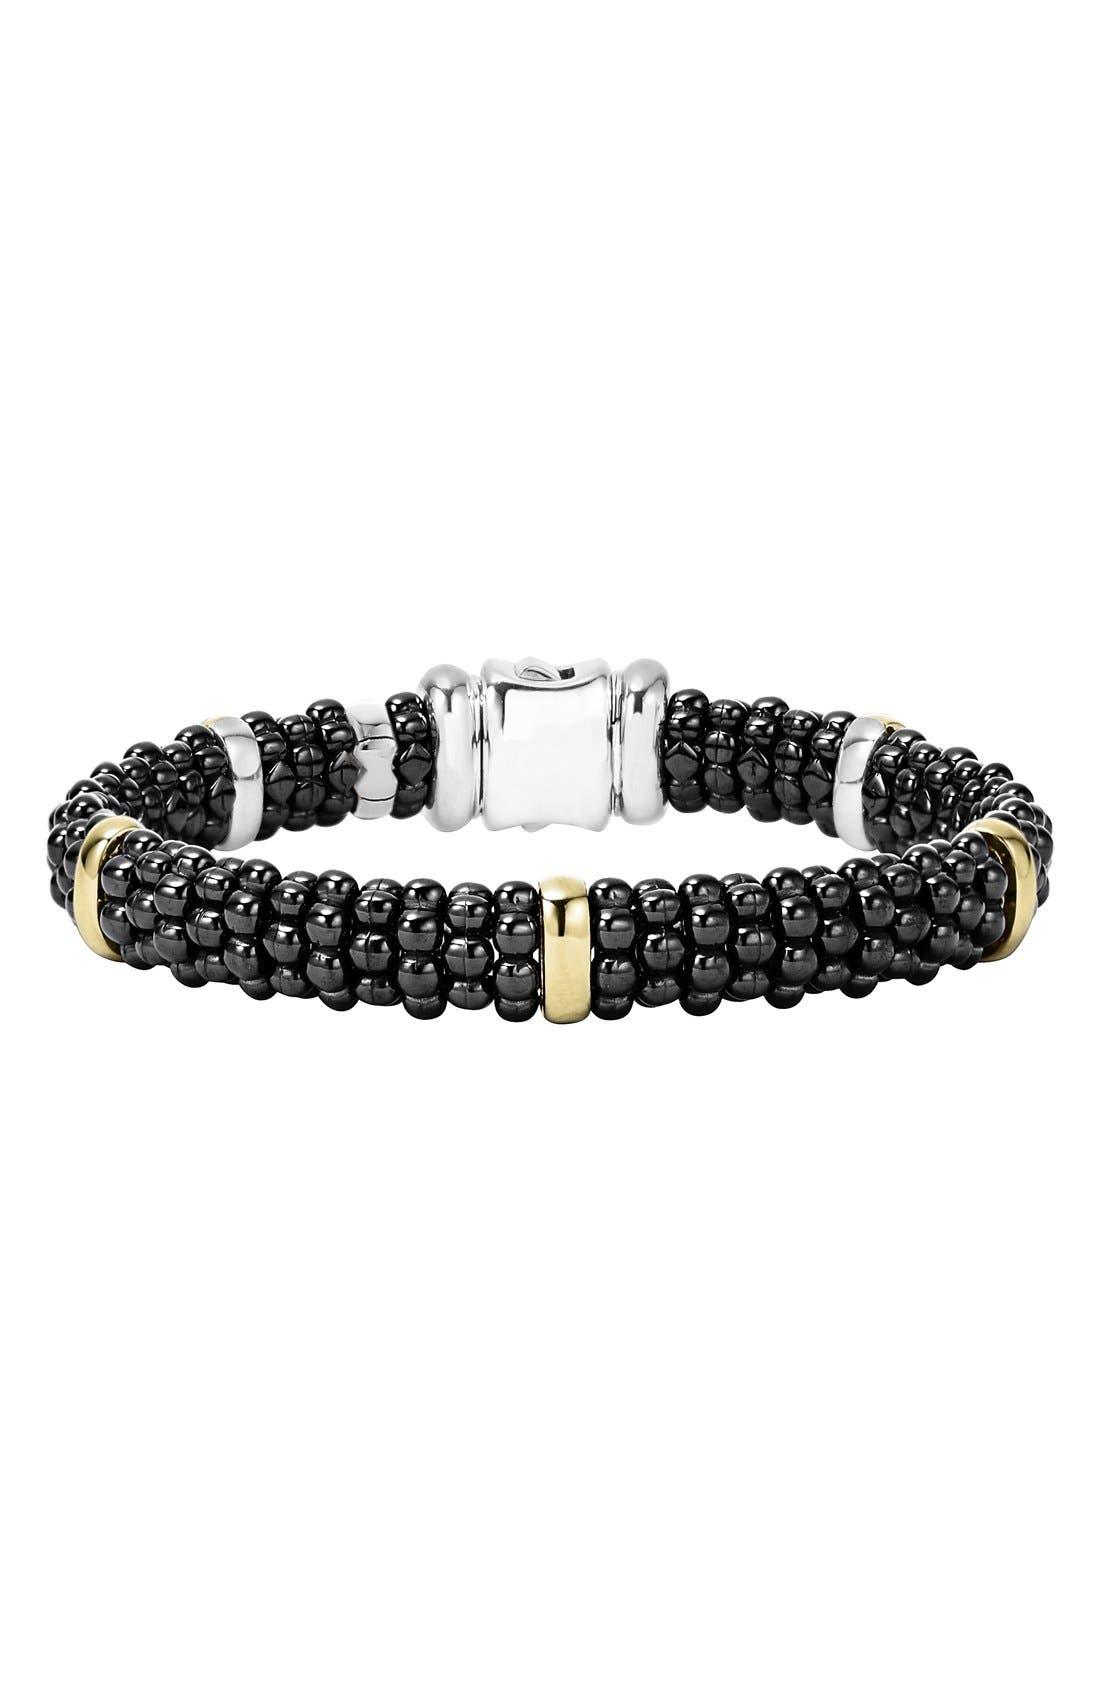 'Black Caviar' Rope Bracelet,                         Main,                         color, Black Caviar/ Gold